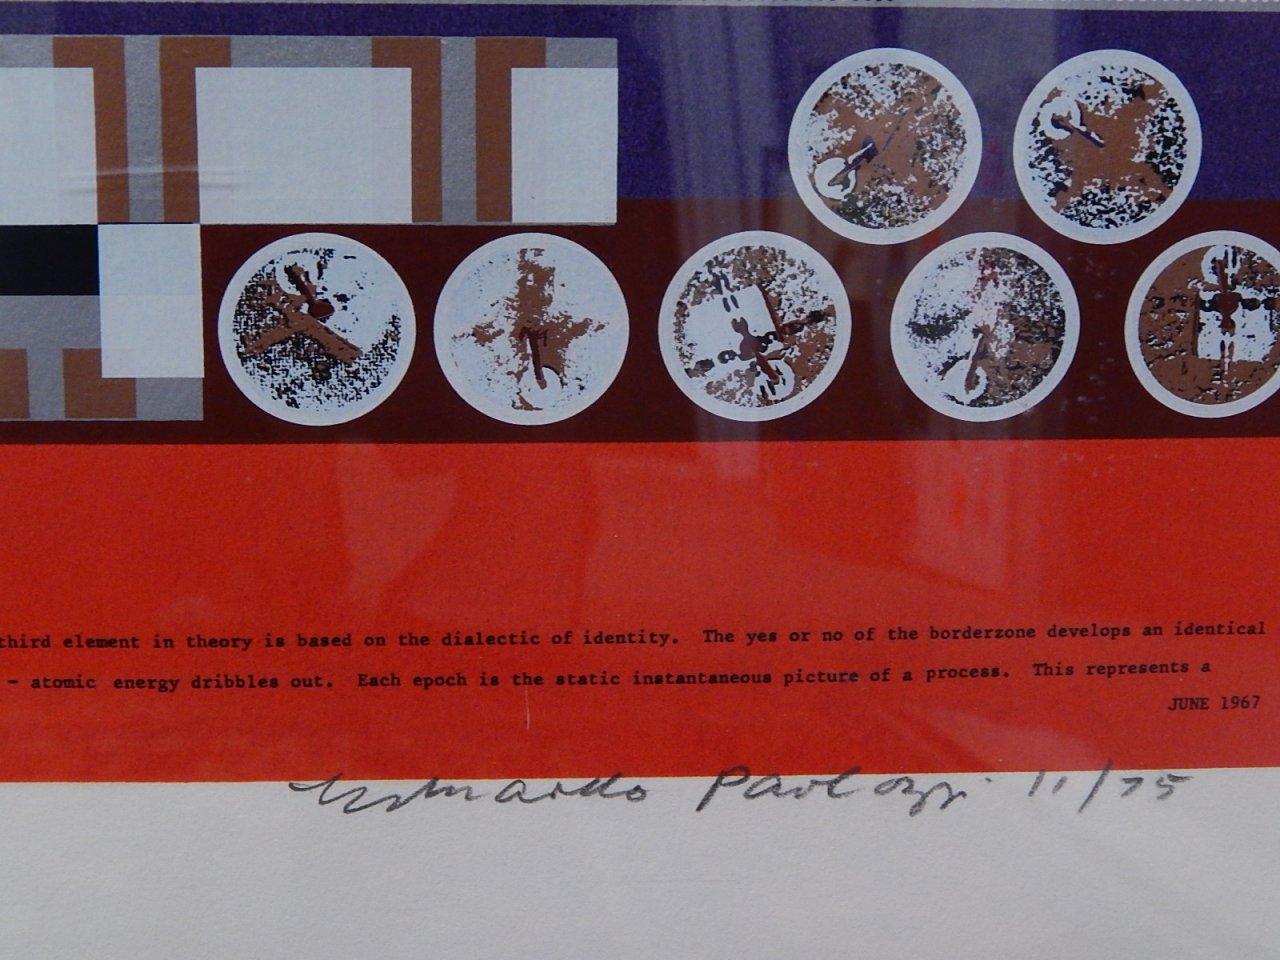 Sir Eduardo Paolozzi Screenprint 1975